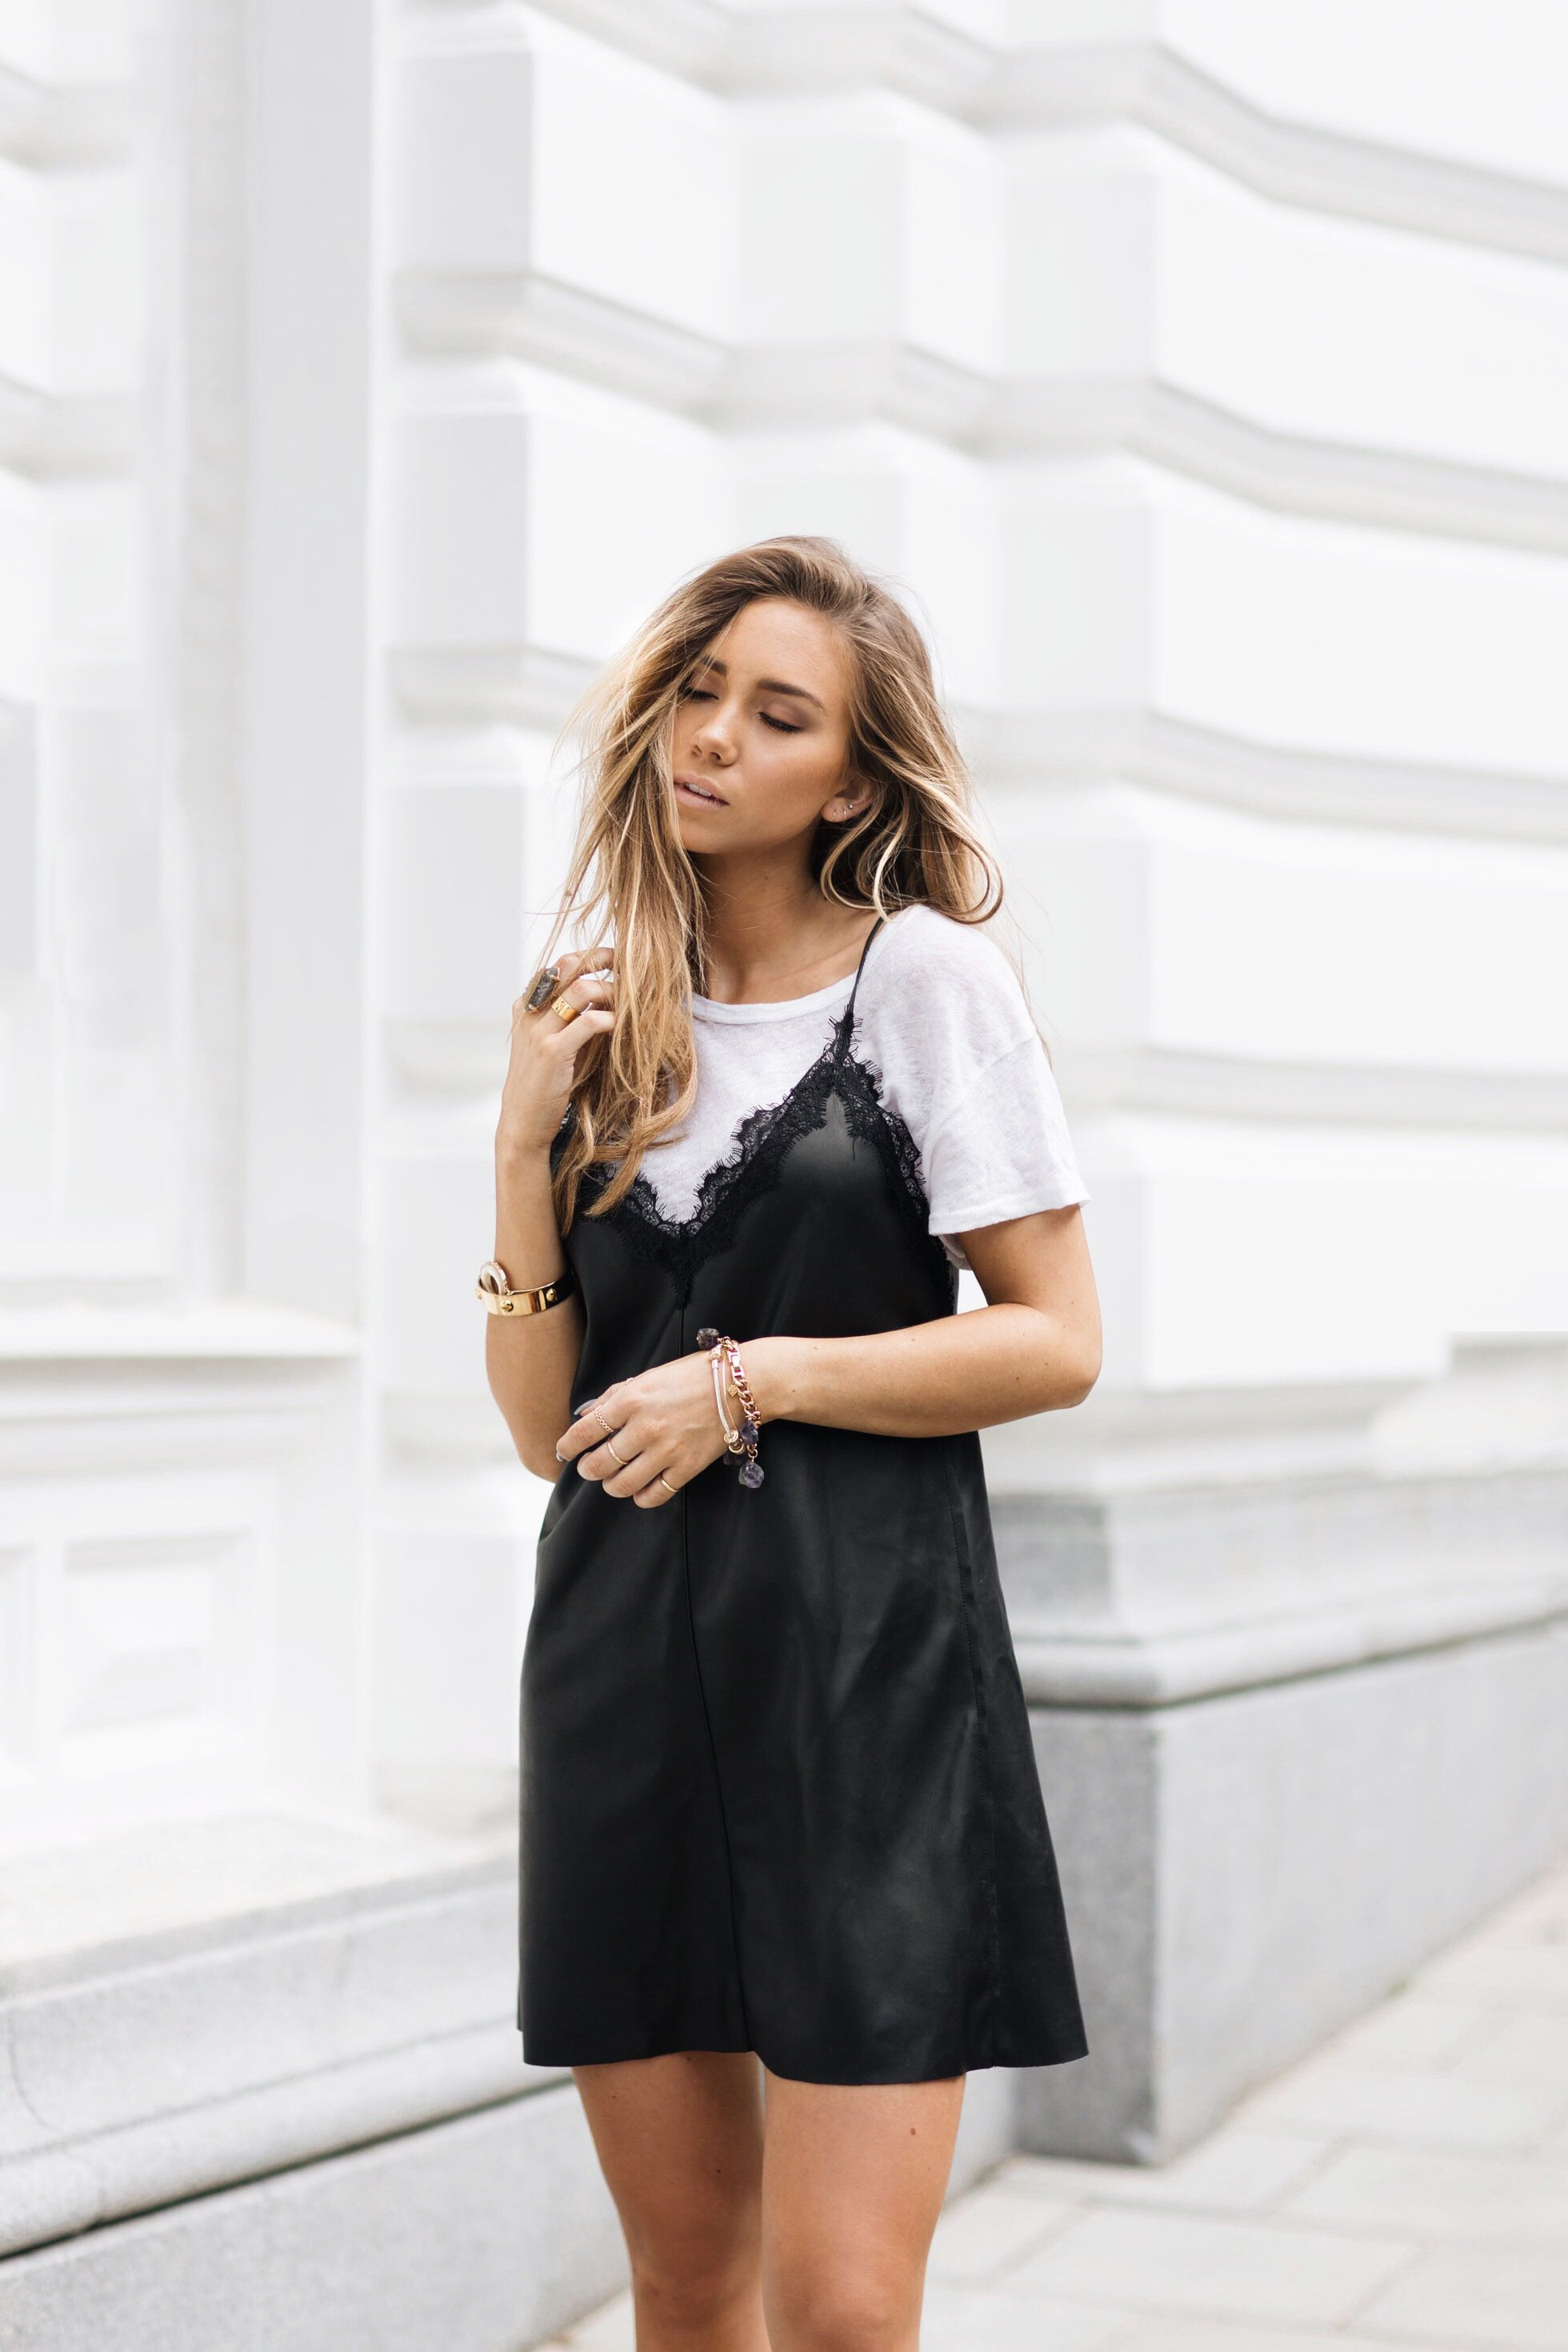 White Shirt Under Slip Dress